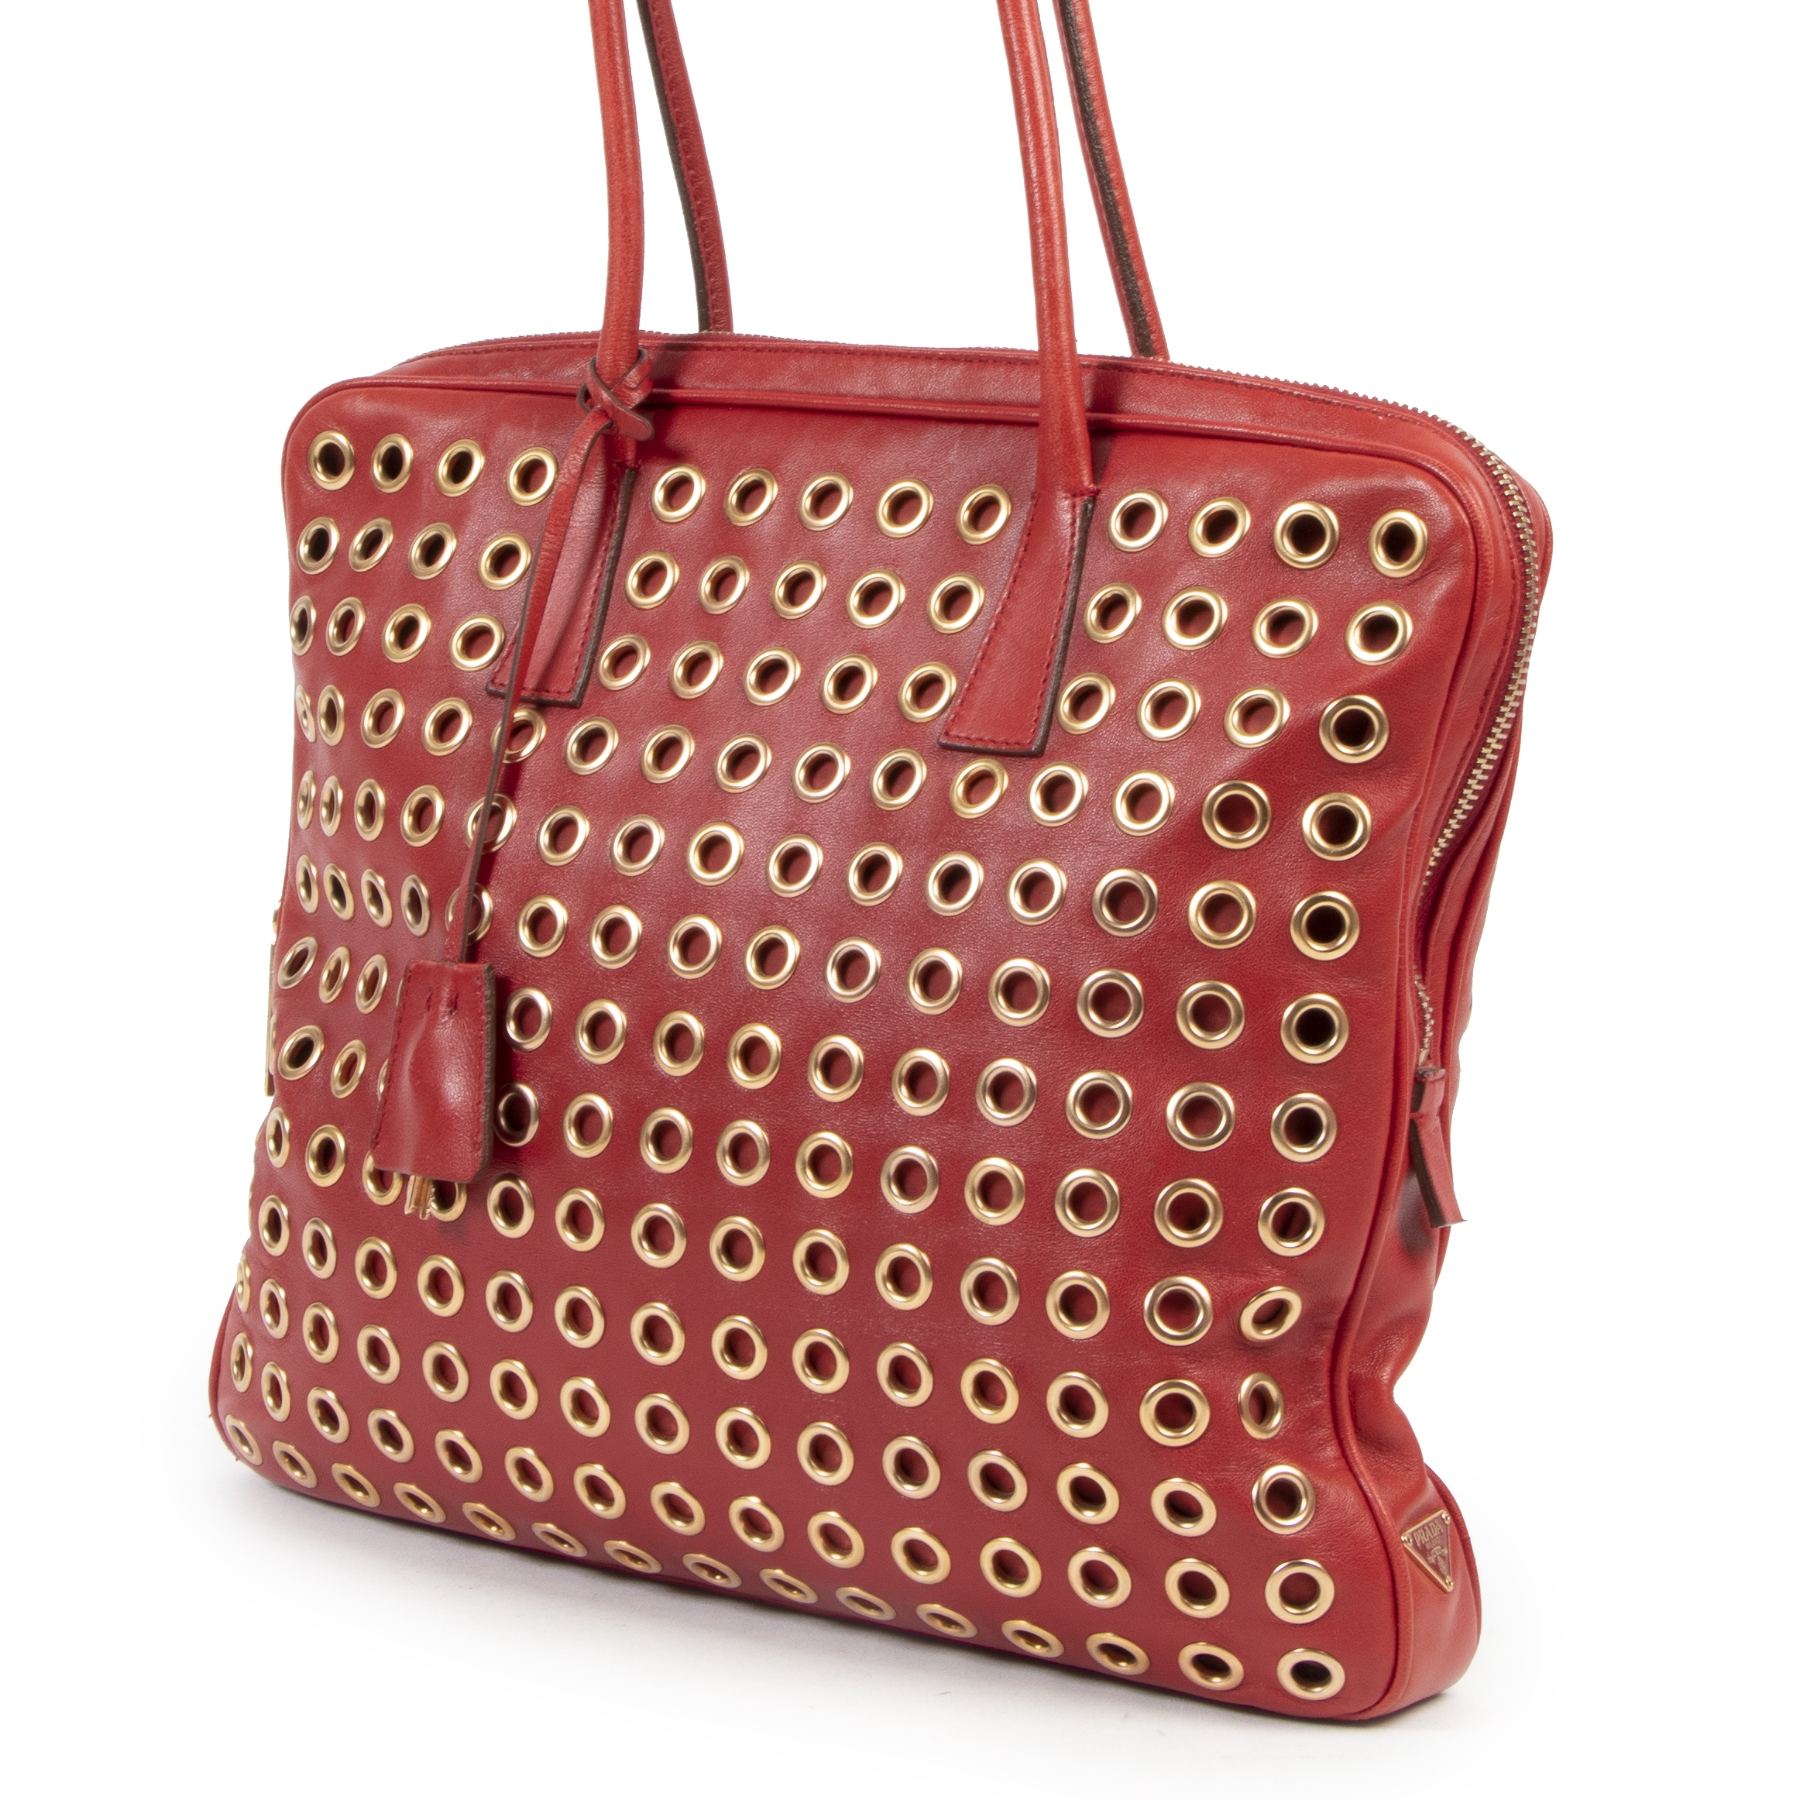 acheter en linge seconde main Prada Grommet Red Tote Bag